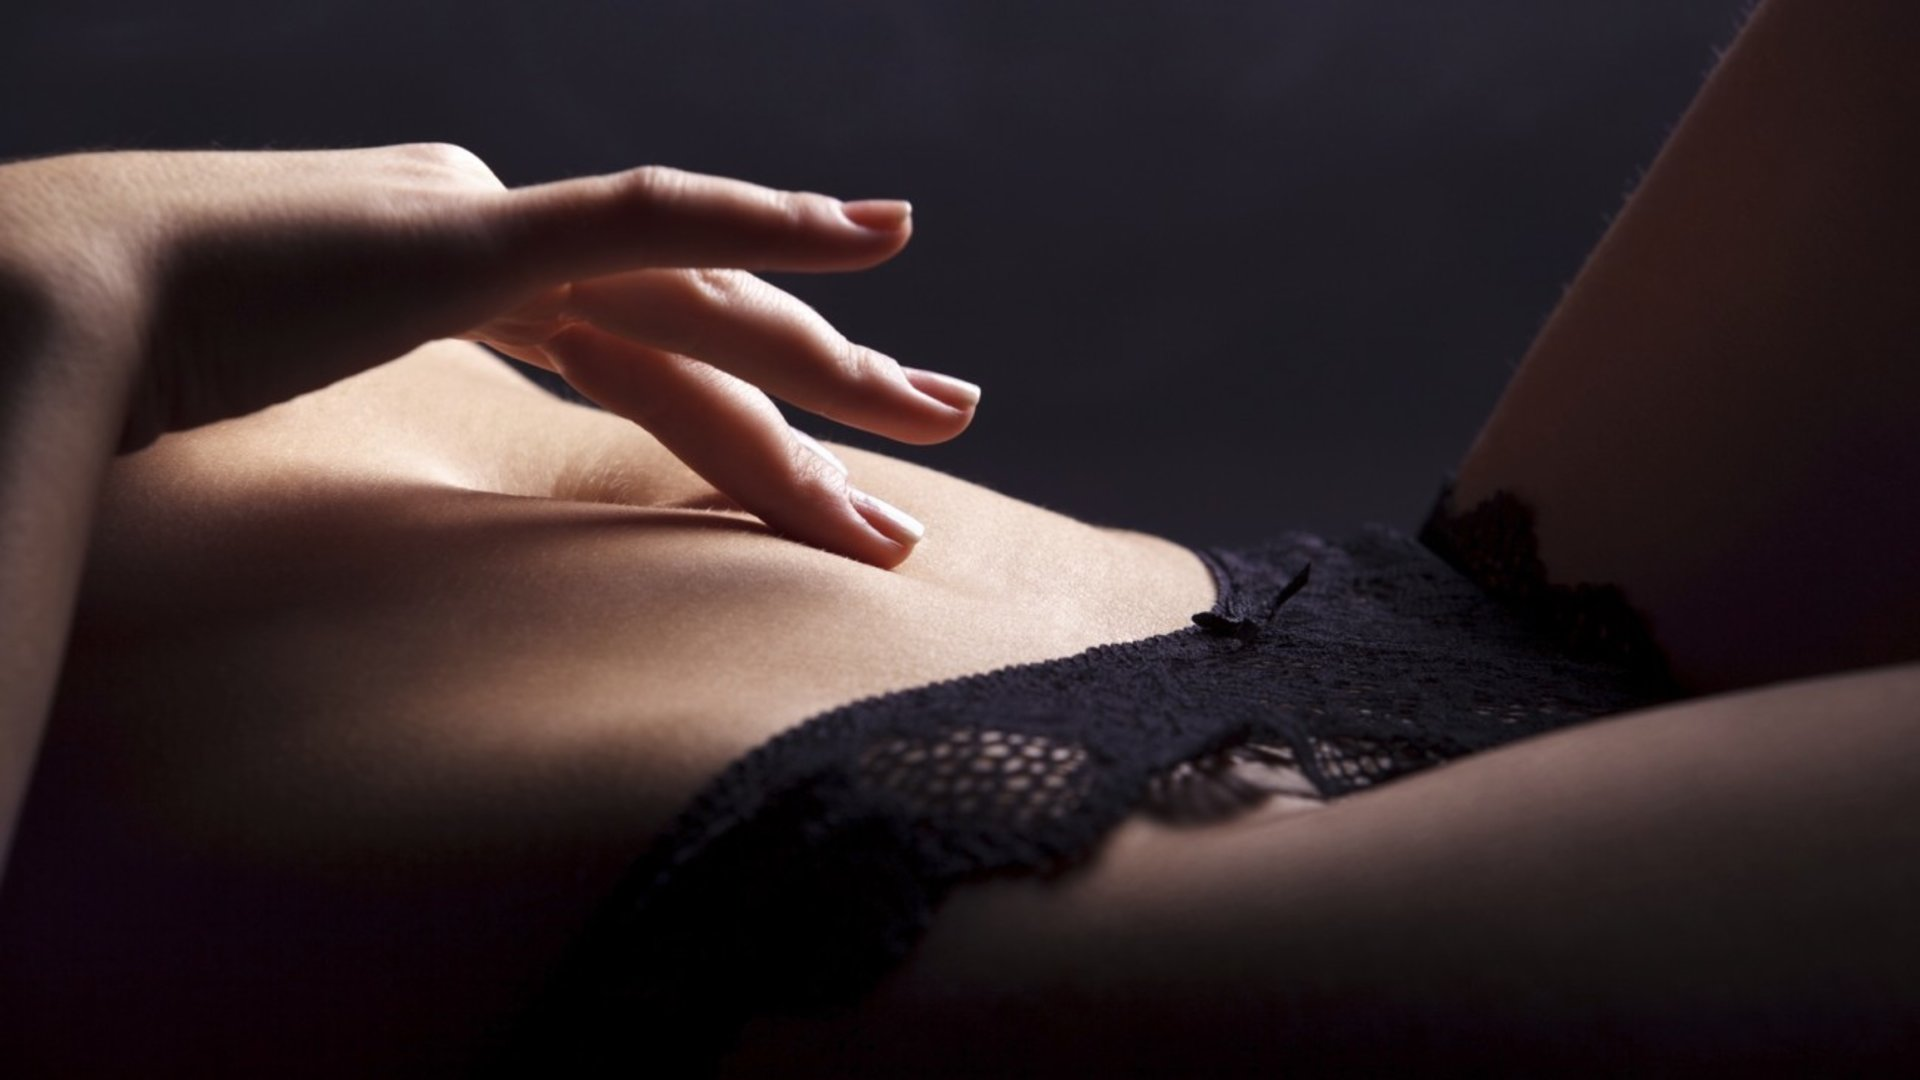 Frau bilder intimpiercing Intimpiercing